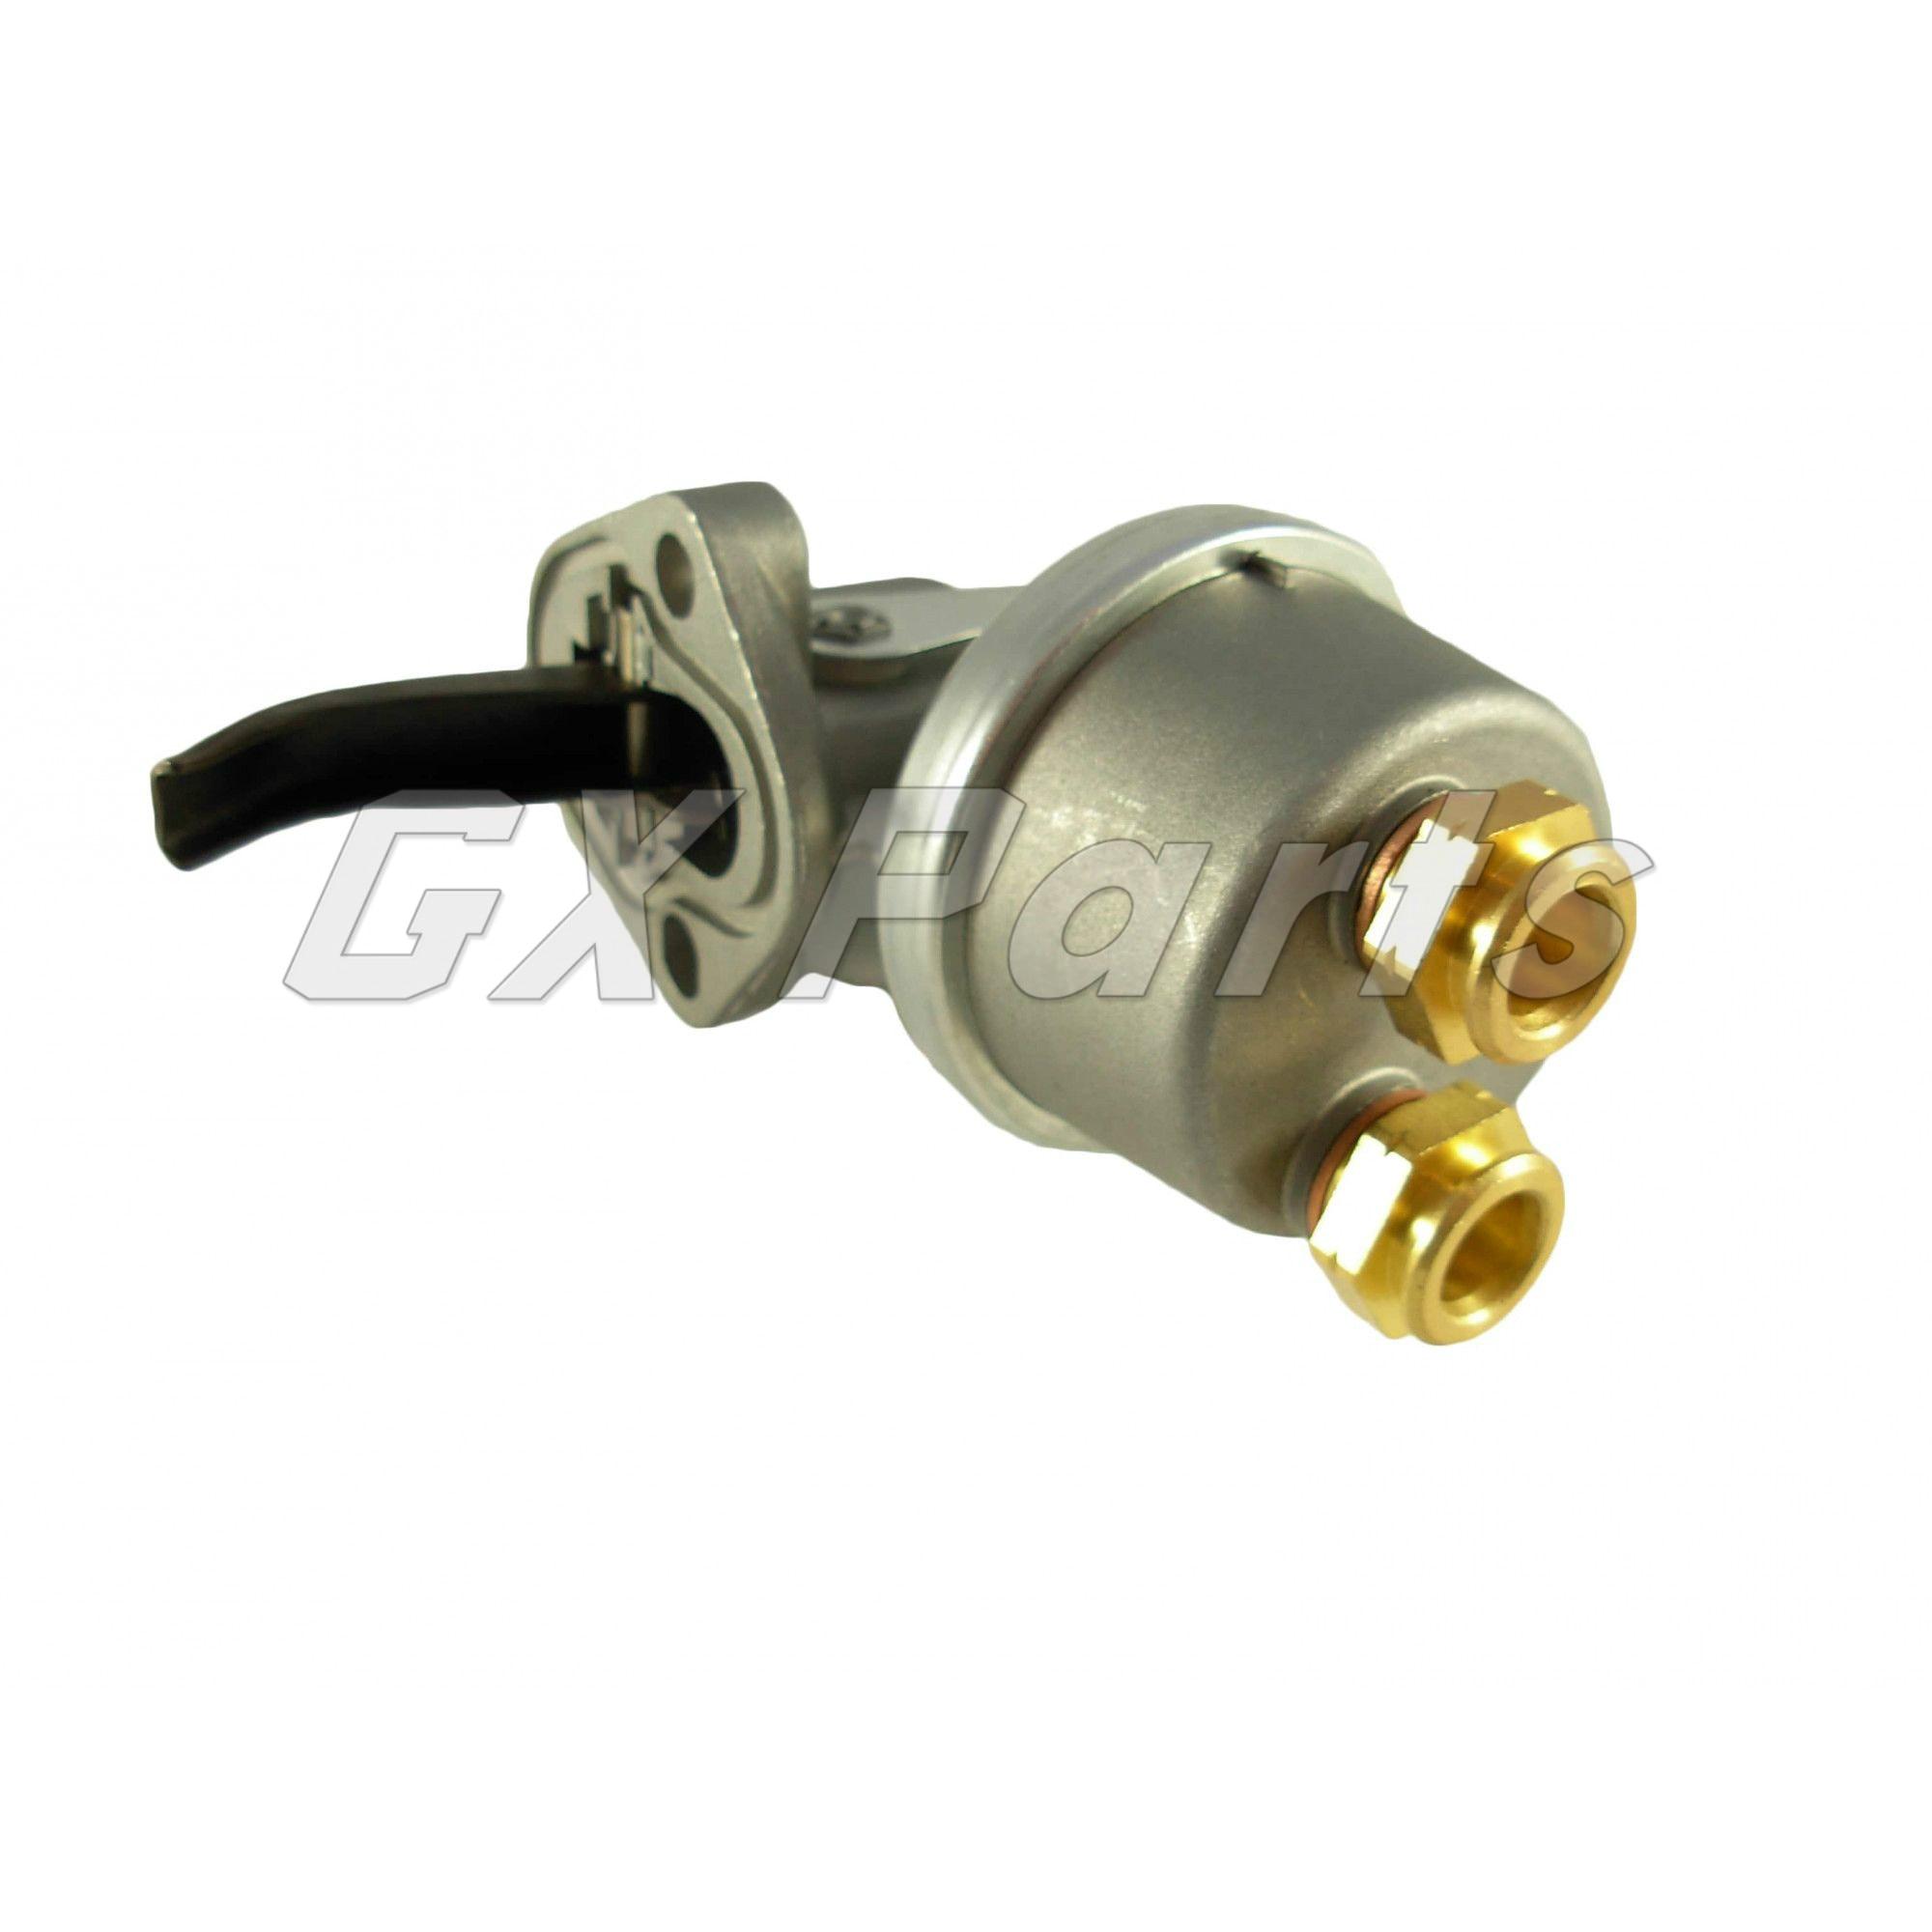 T6105 SUN 106 SU TI056SU 104 956 Sz Machparts Fuel Lift Pump 2134511 Fits for VM 1056 954 6105